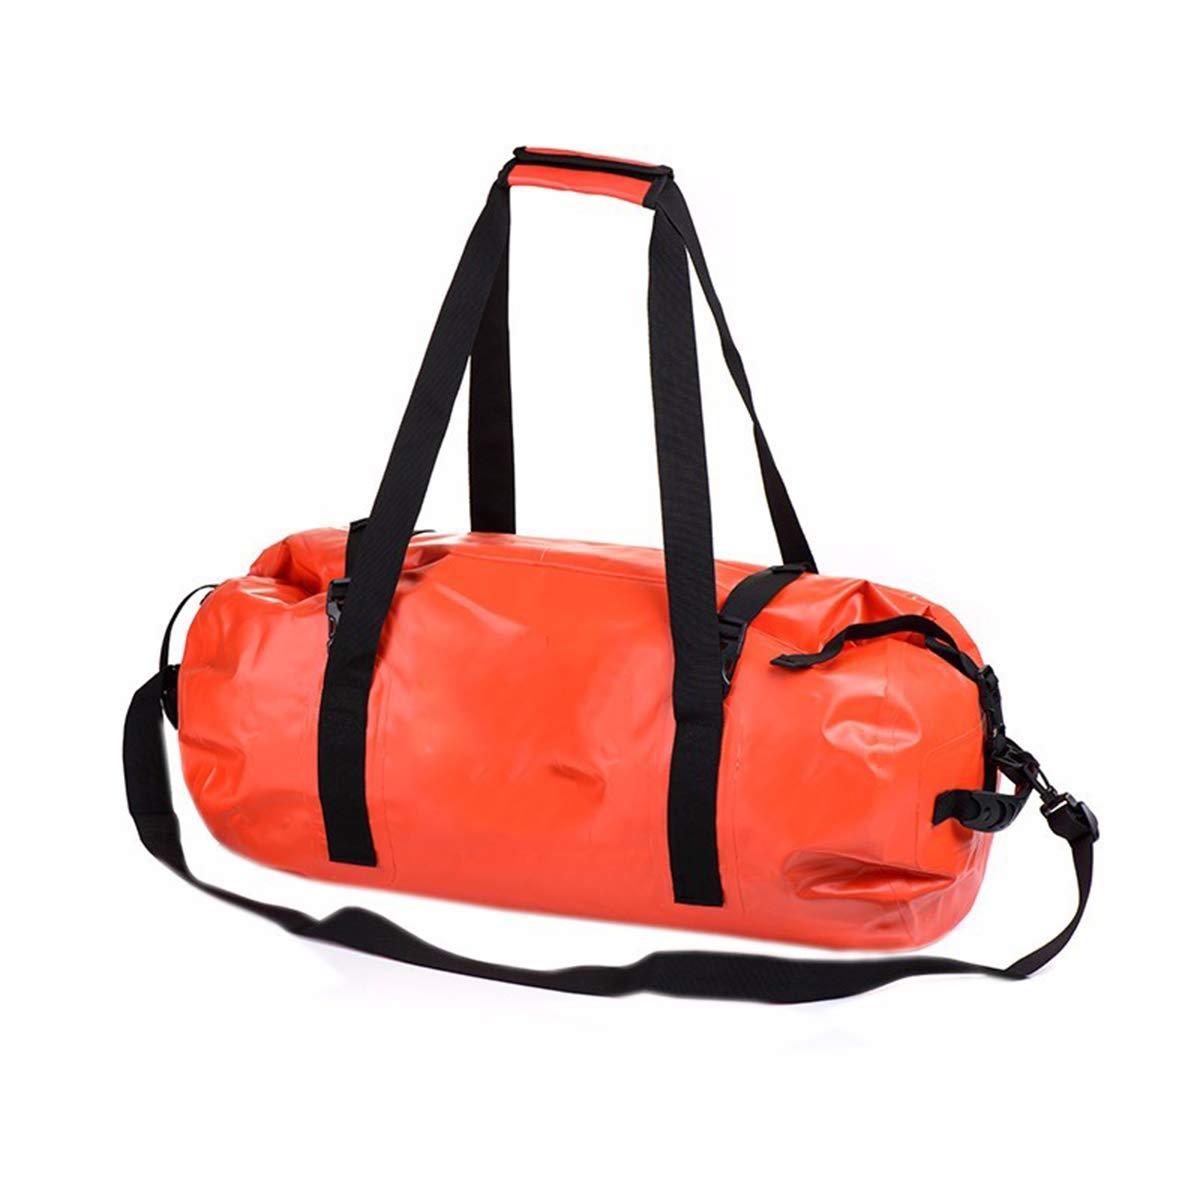 AMODA 40L 60L 90L 120L Large Capacity Outdoor Waterproof Swimming Bag Multifunctional Floating Diving Dry Bag Storage Kayak Bags Rafting Drift (Orange, 40L)